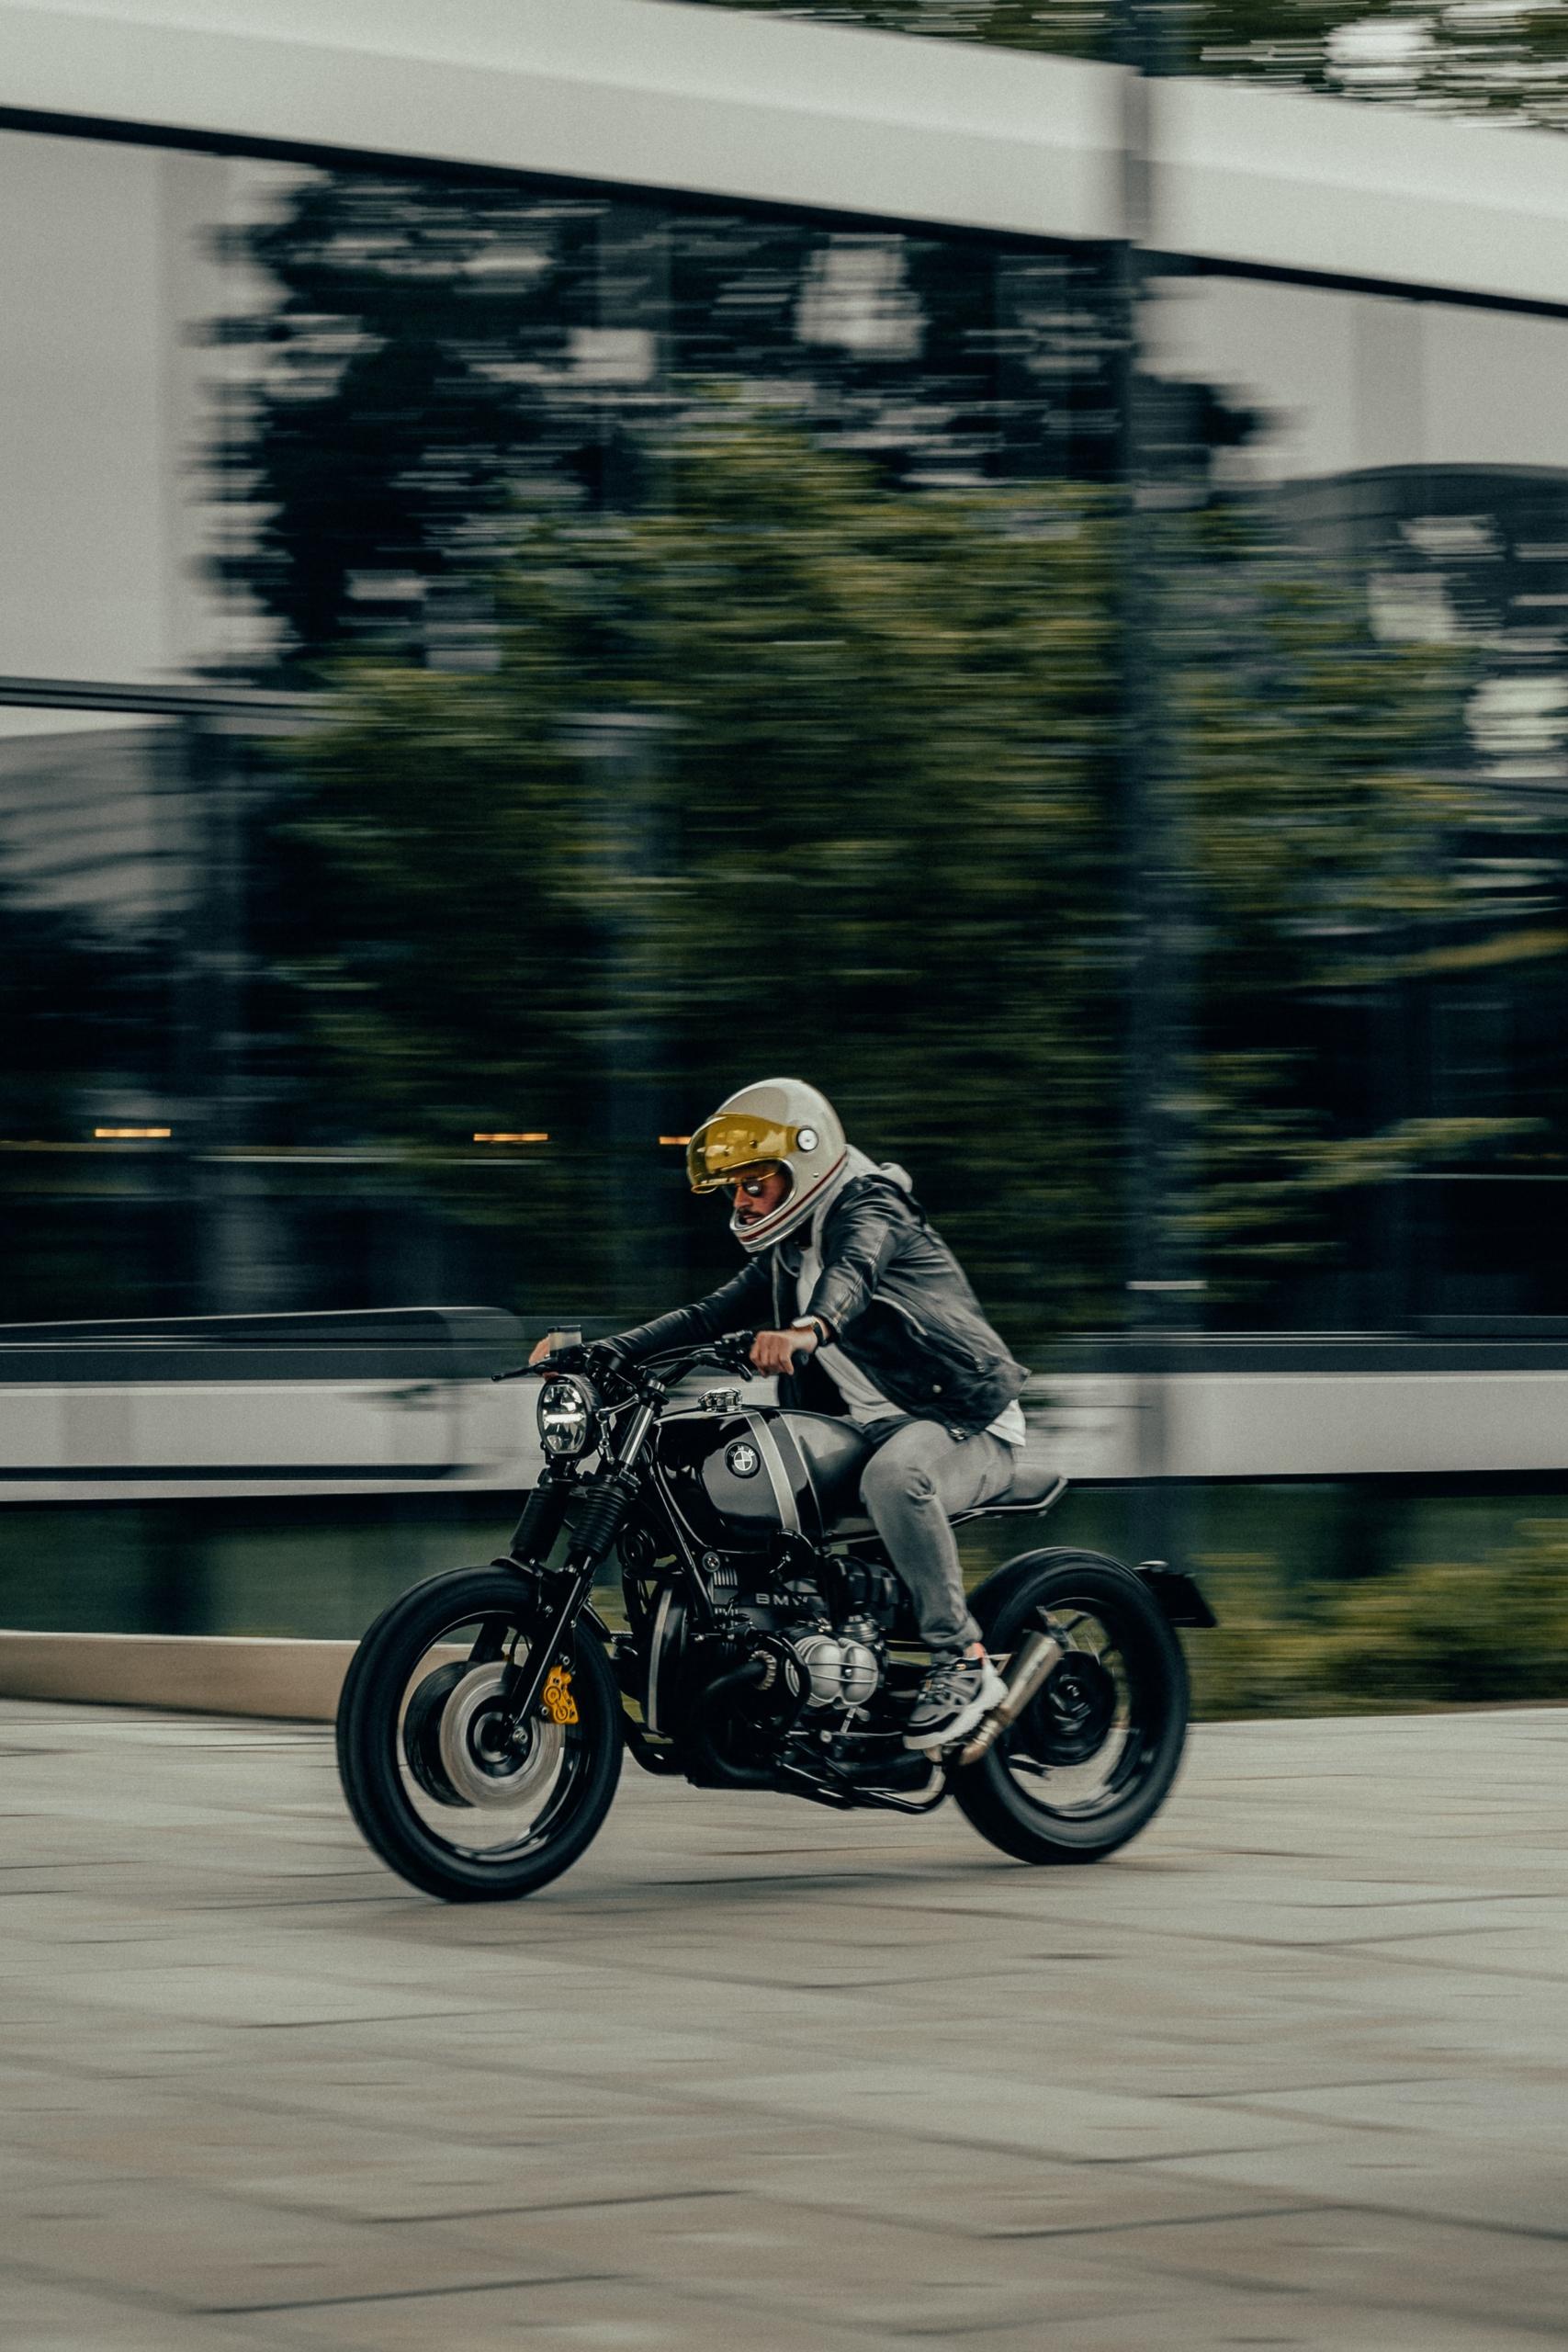 BMW Cafe Racer - caferacerdesign | ello